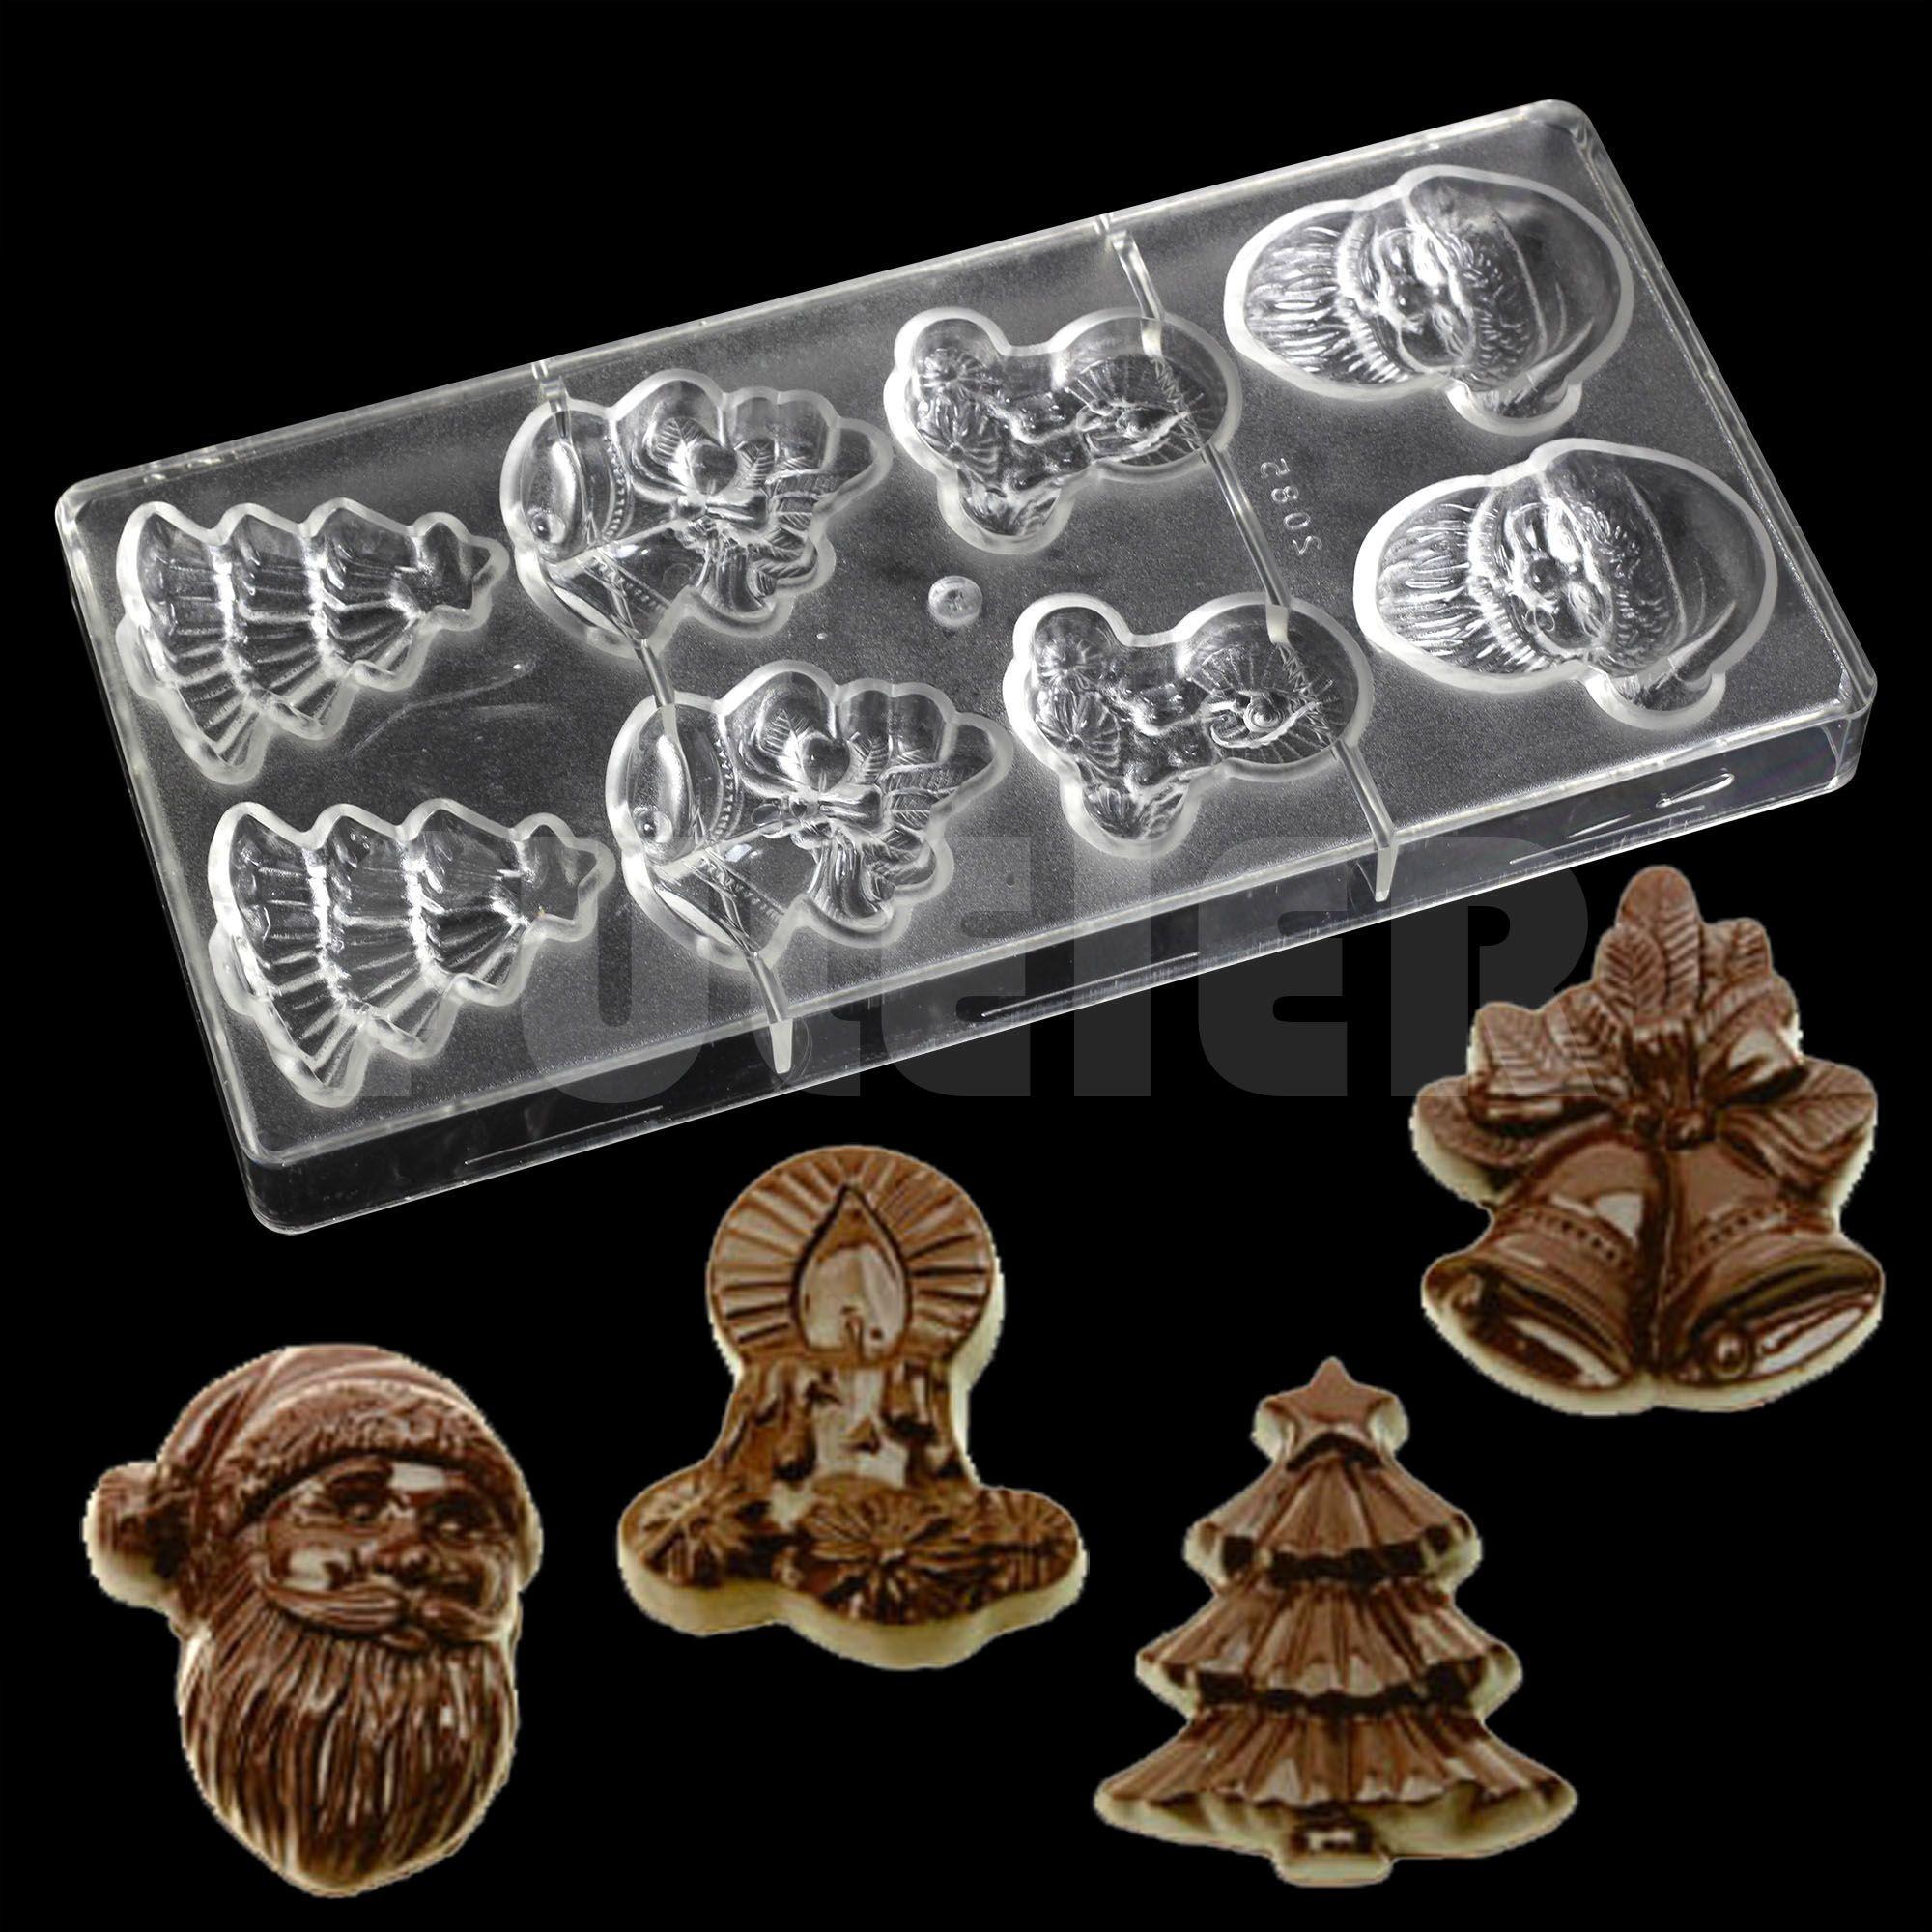 Série de natal papai noel sino forma policarbonato molde de chocolate, barato cozinha bakeware assando bolo molde de chocolate doce